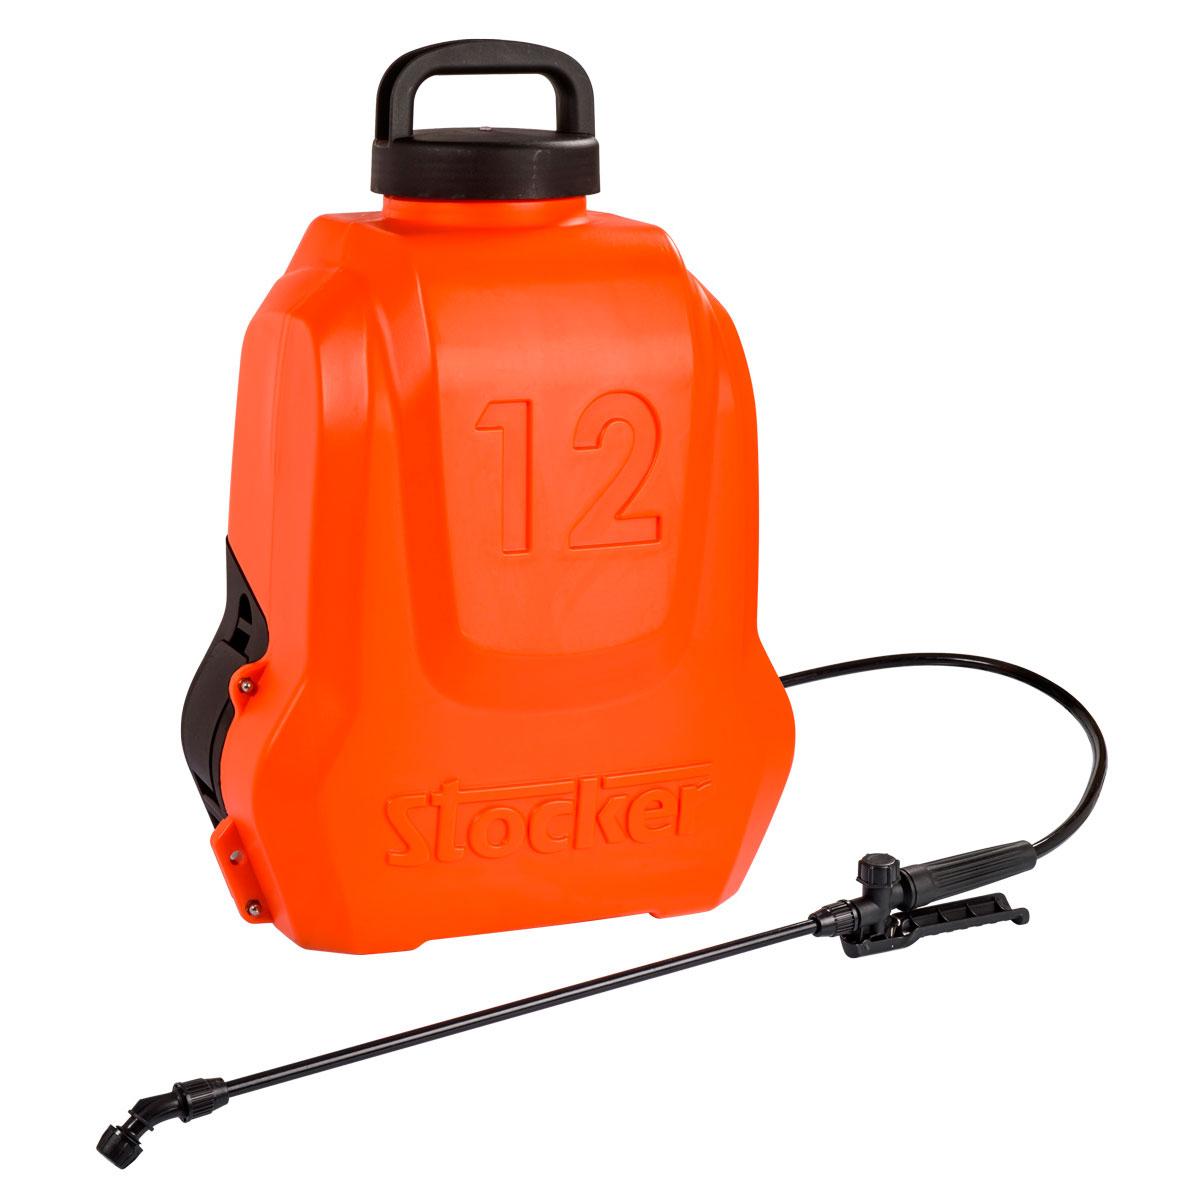 Stocker Pompa a zaino elettrica 12l Li-Ion